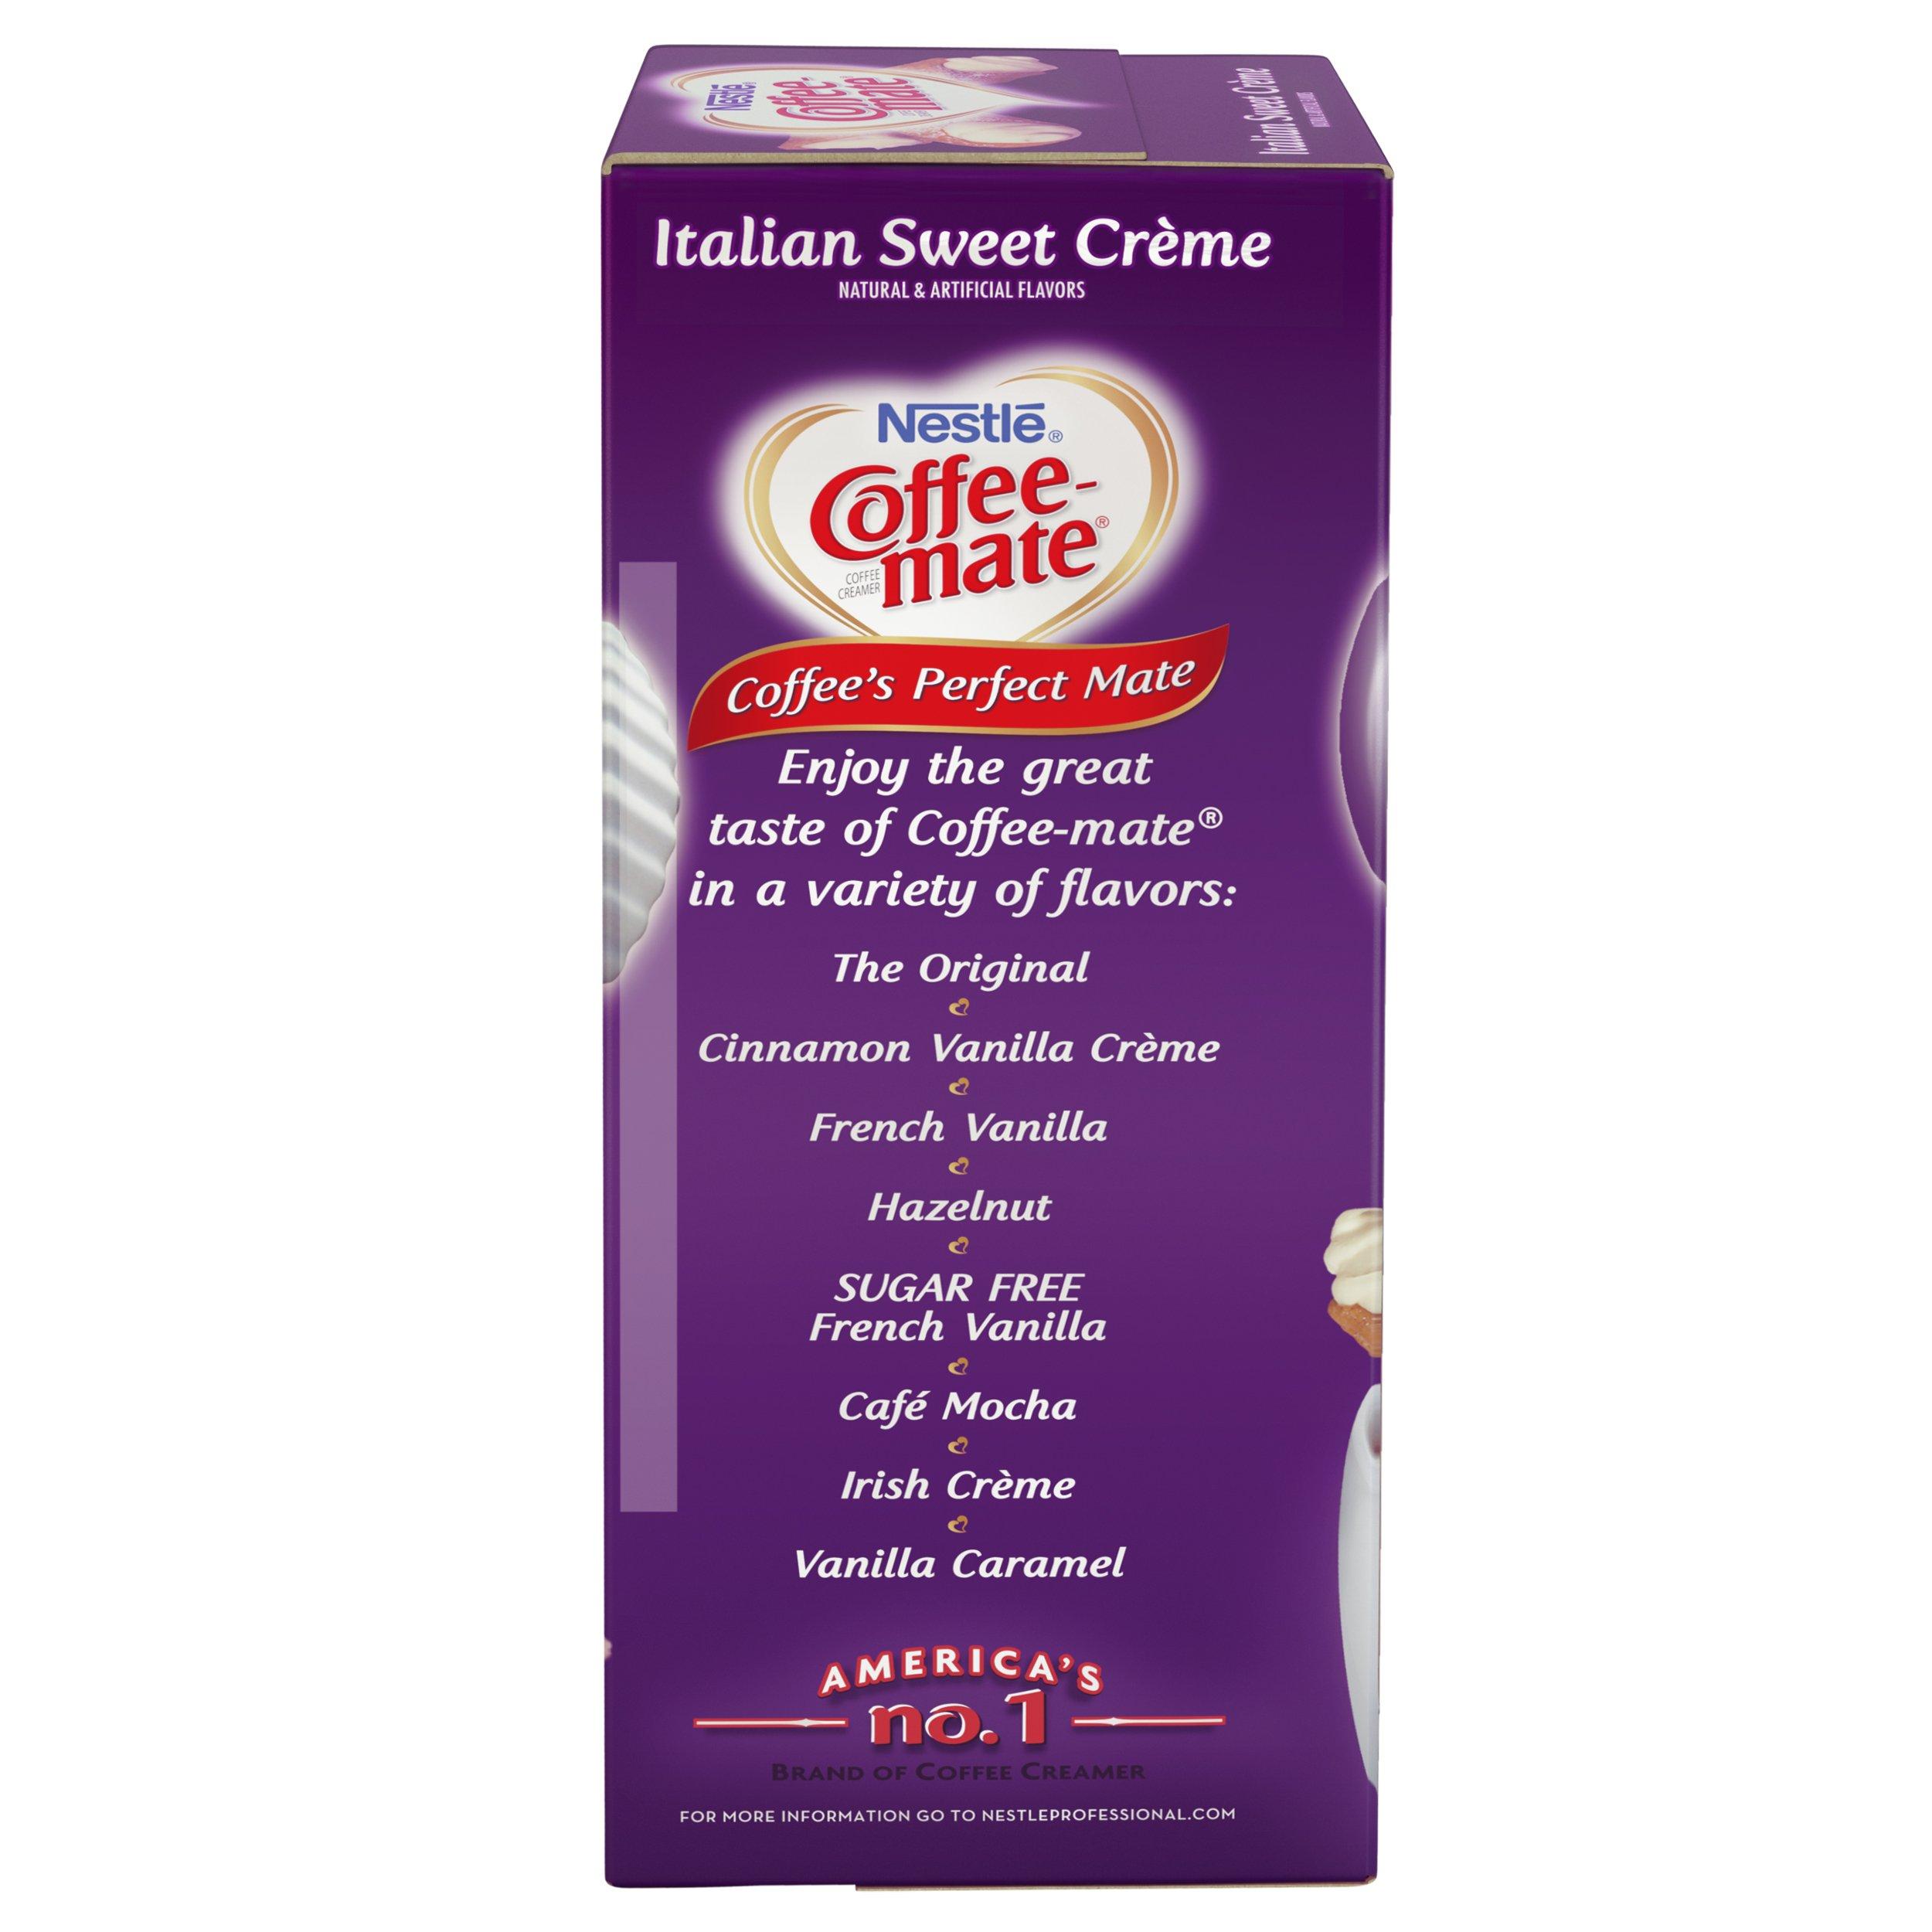 NESTLE COFFEE-MATE Coffee Creamer, Italian Sweet Creme, liquid creamer singles, Pack of 200 by Nestle Coffee Mate (Image #5)